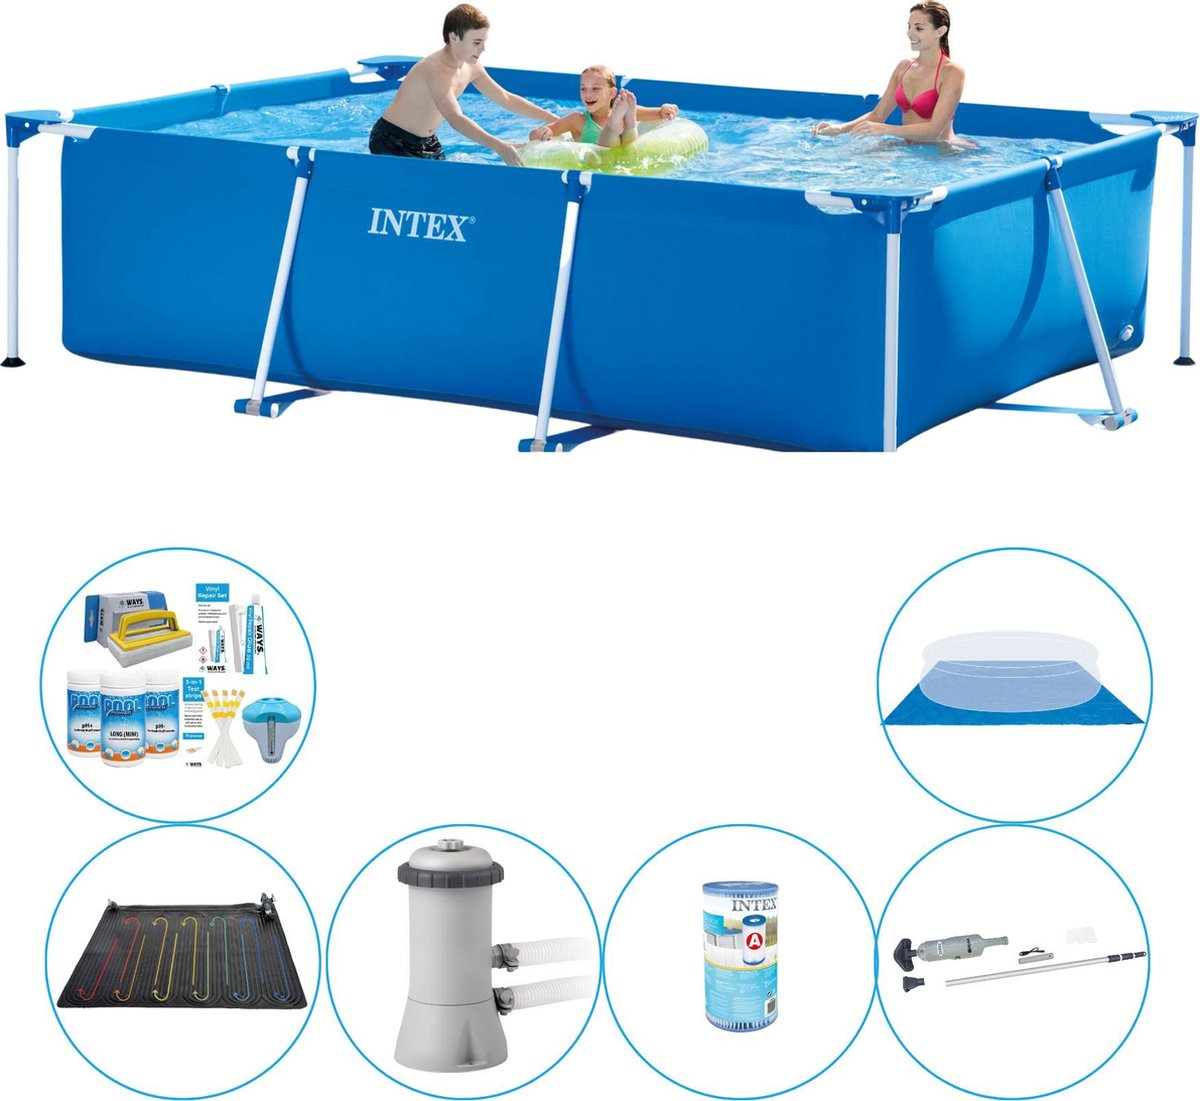 Intex Frame Pool Rechthoekig 300x200x75 cm - 7-delig - Zwembad Deal